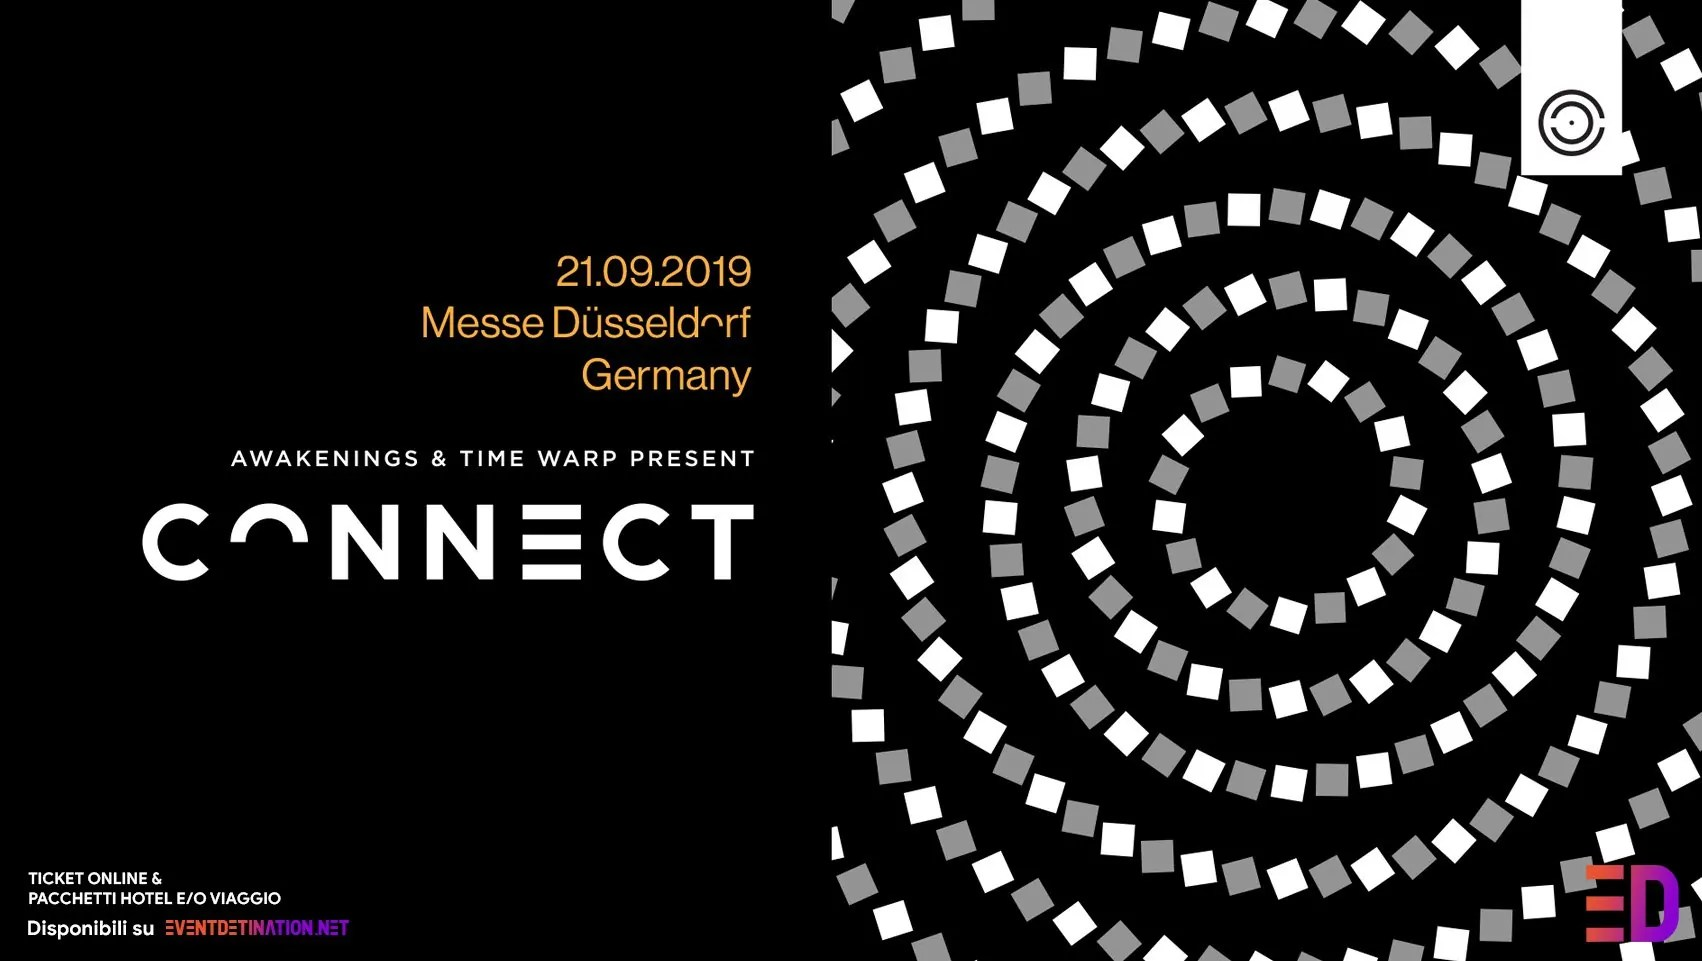 Connect Festival 2019 Düsseldorf – 21 Settembre 2019 by Time Warp & Awakenings -Ticket e Pacchetti Hotel